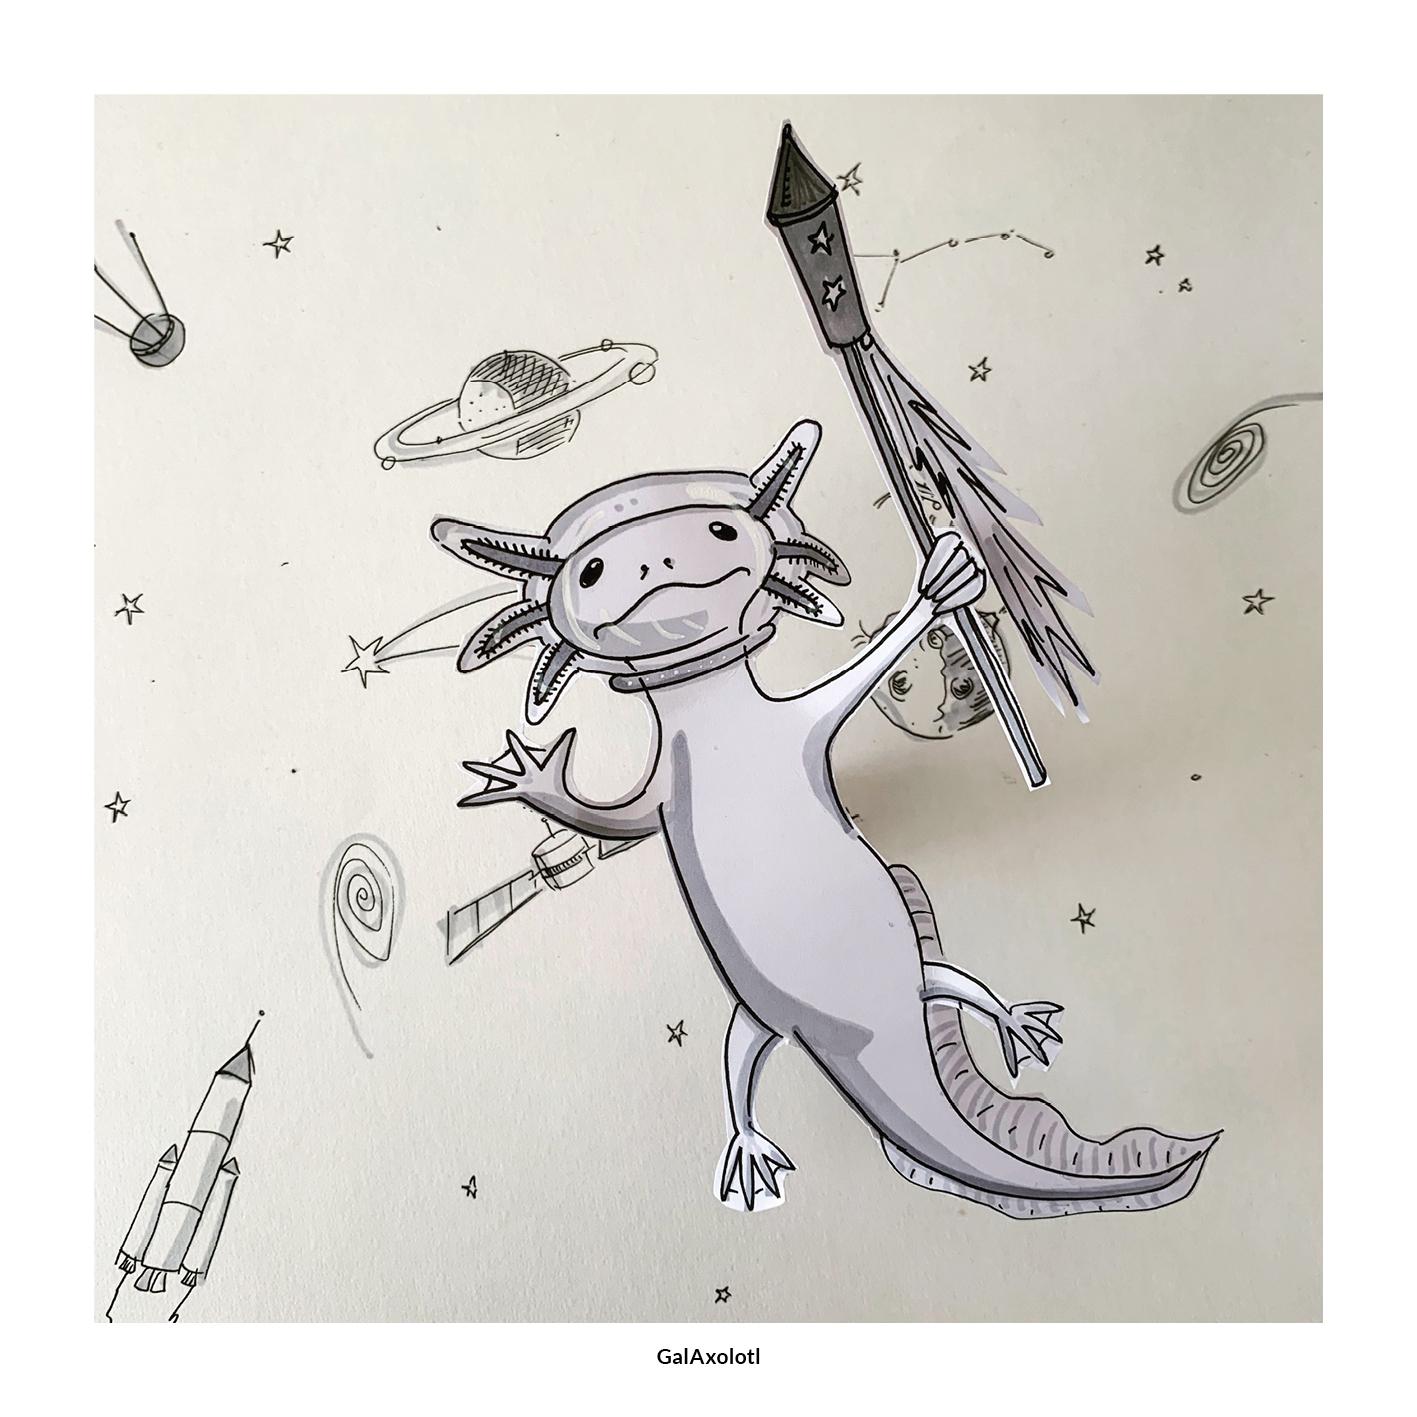 GalAxolotl